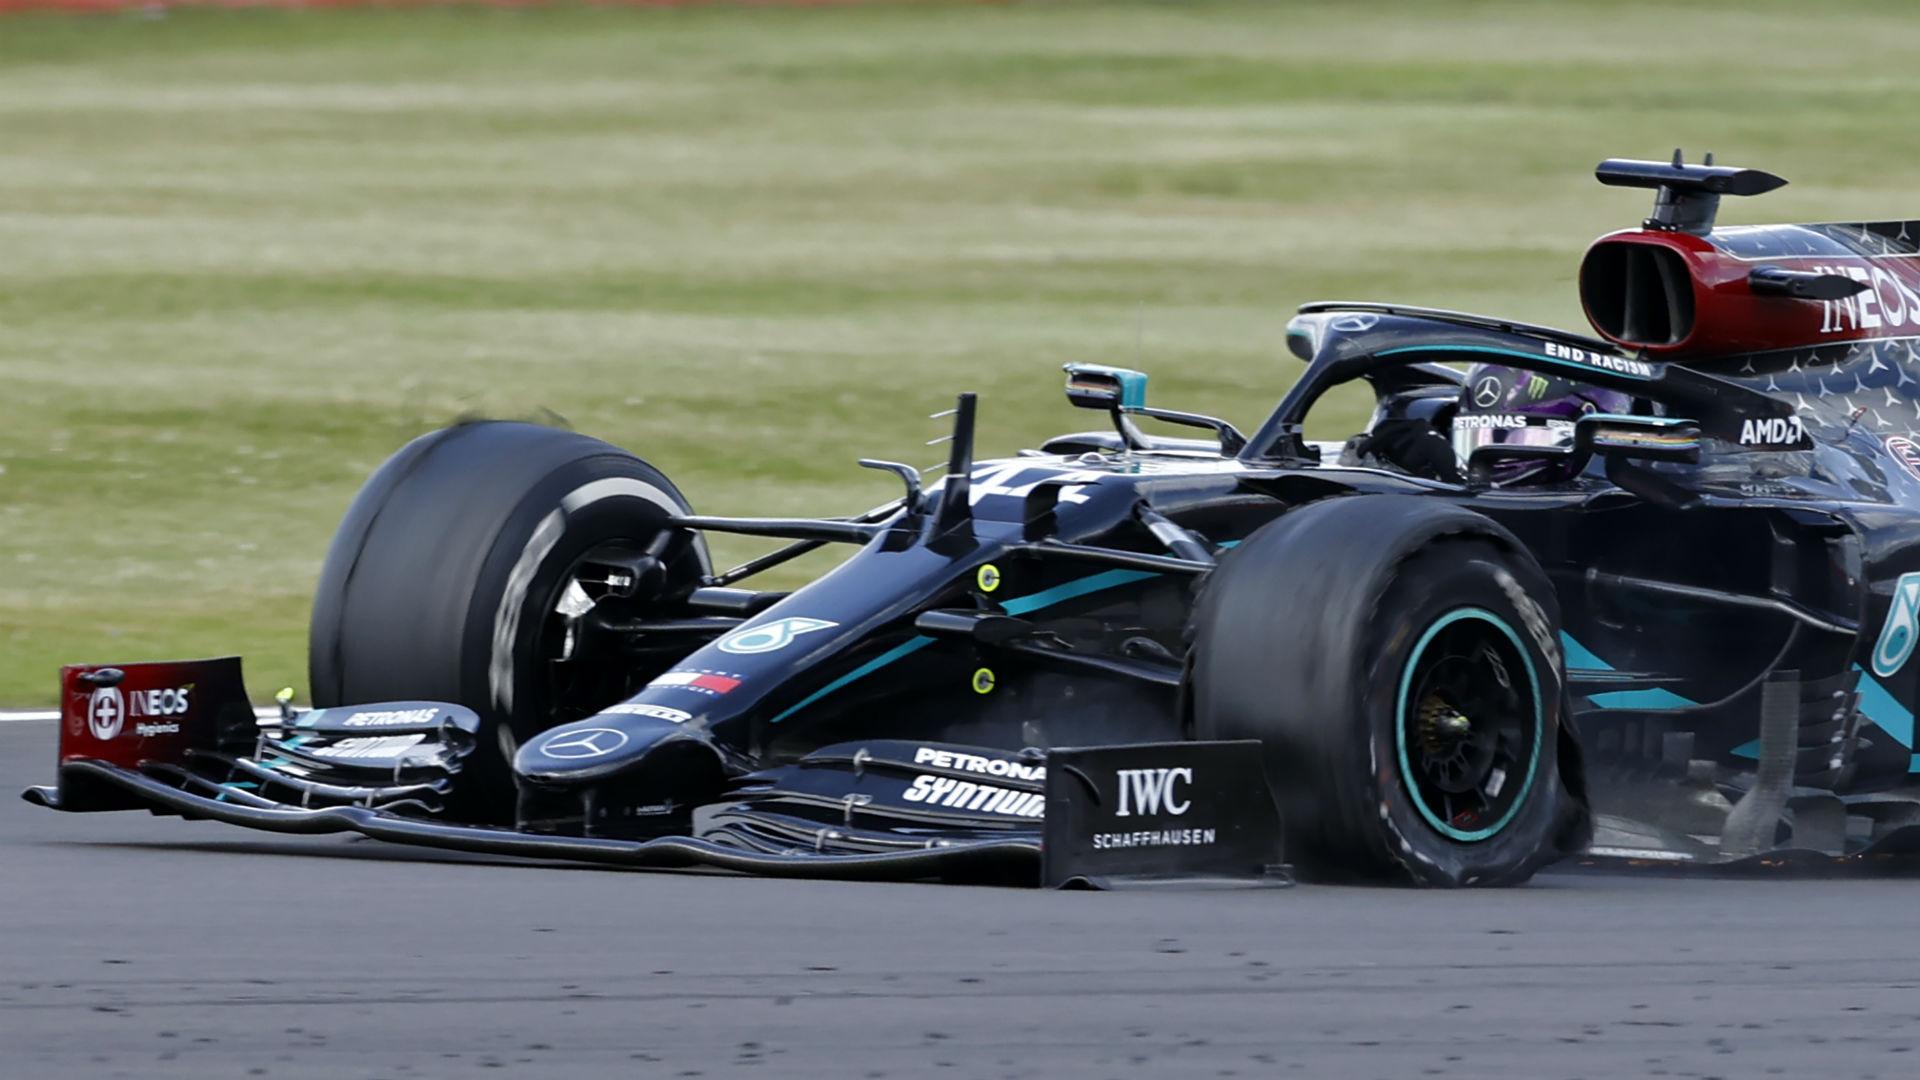 Formula 1 British Grand Prix results: Lewis Hamilton sets a record —with a flat tire 1